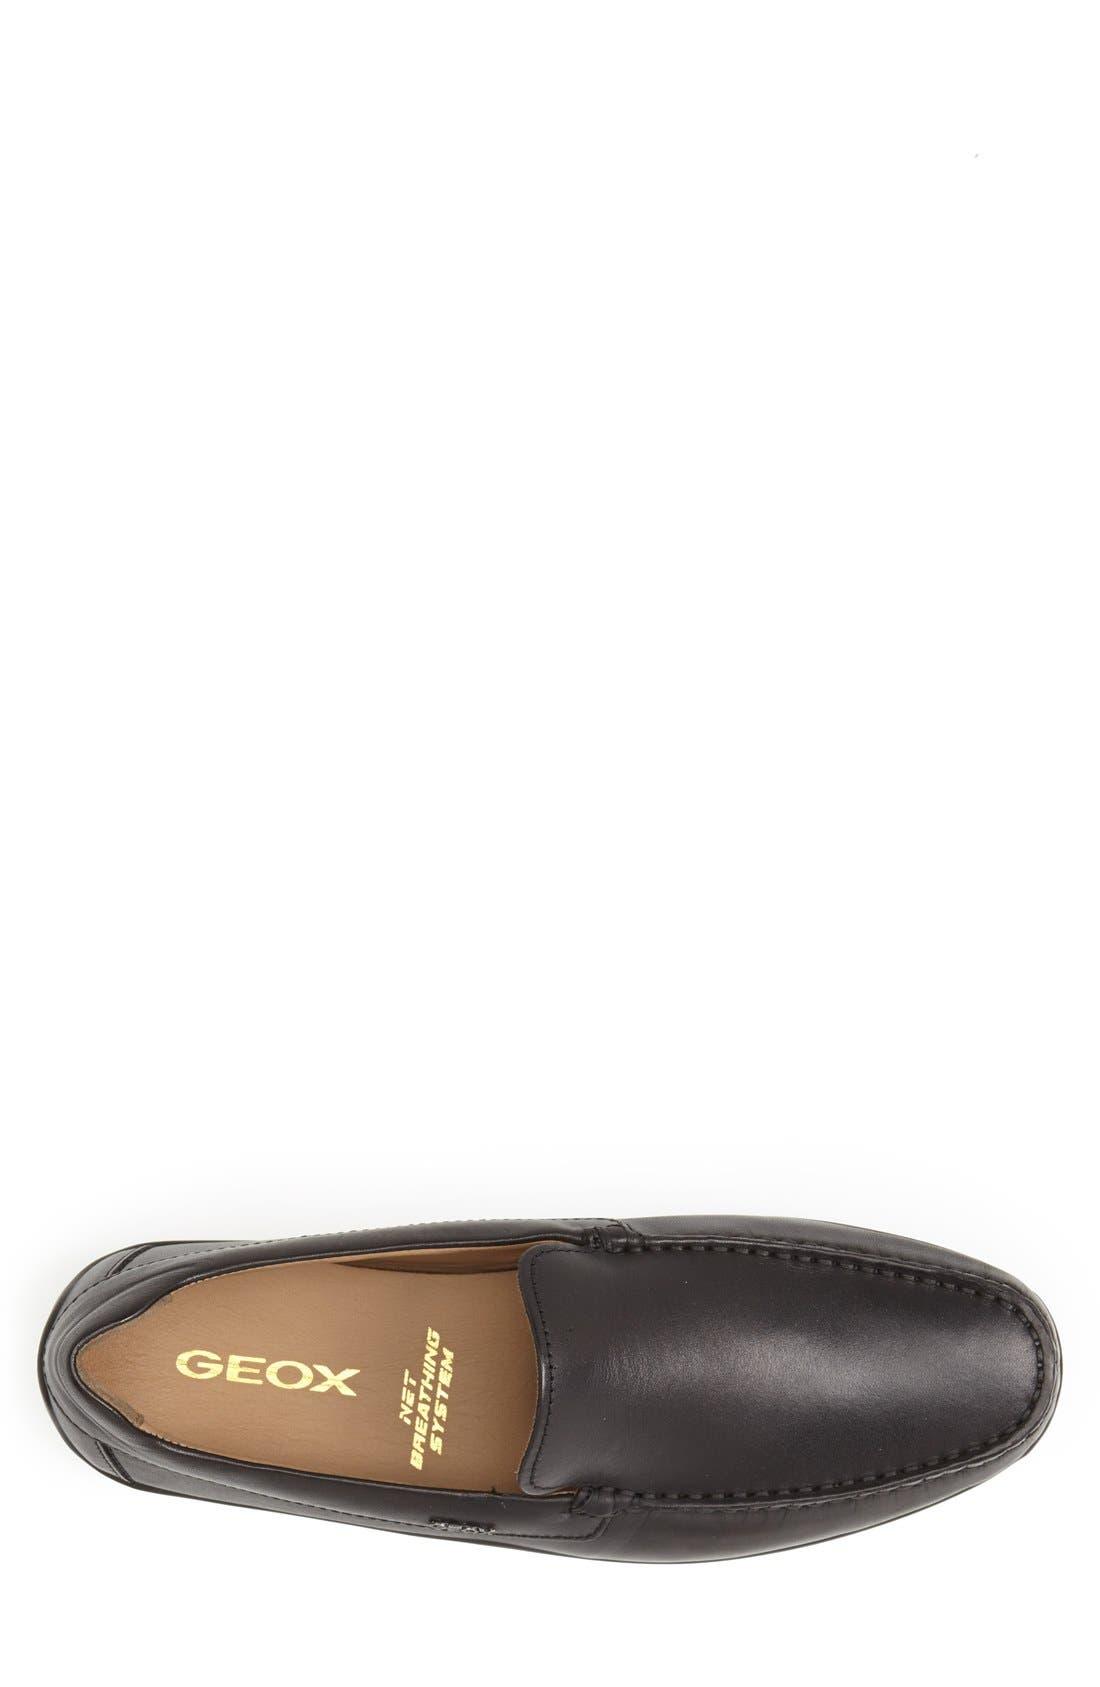 Alternate Image 3  - Geox 'U Xense Mox' Driving Shoe (Men)